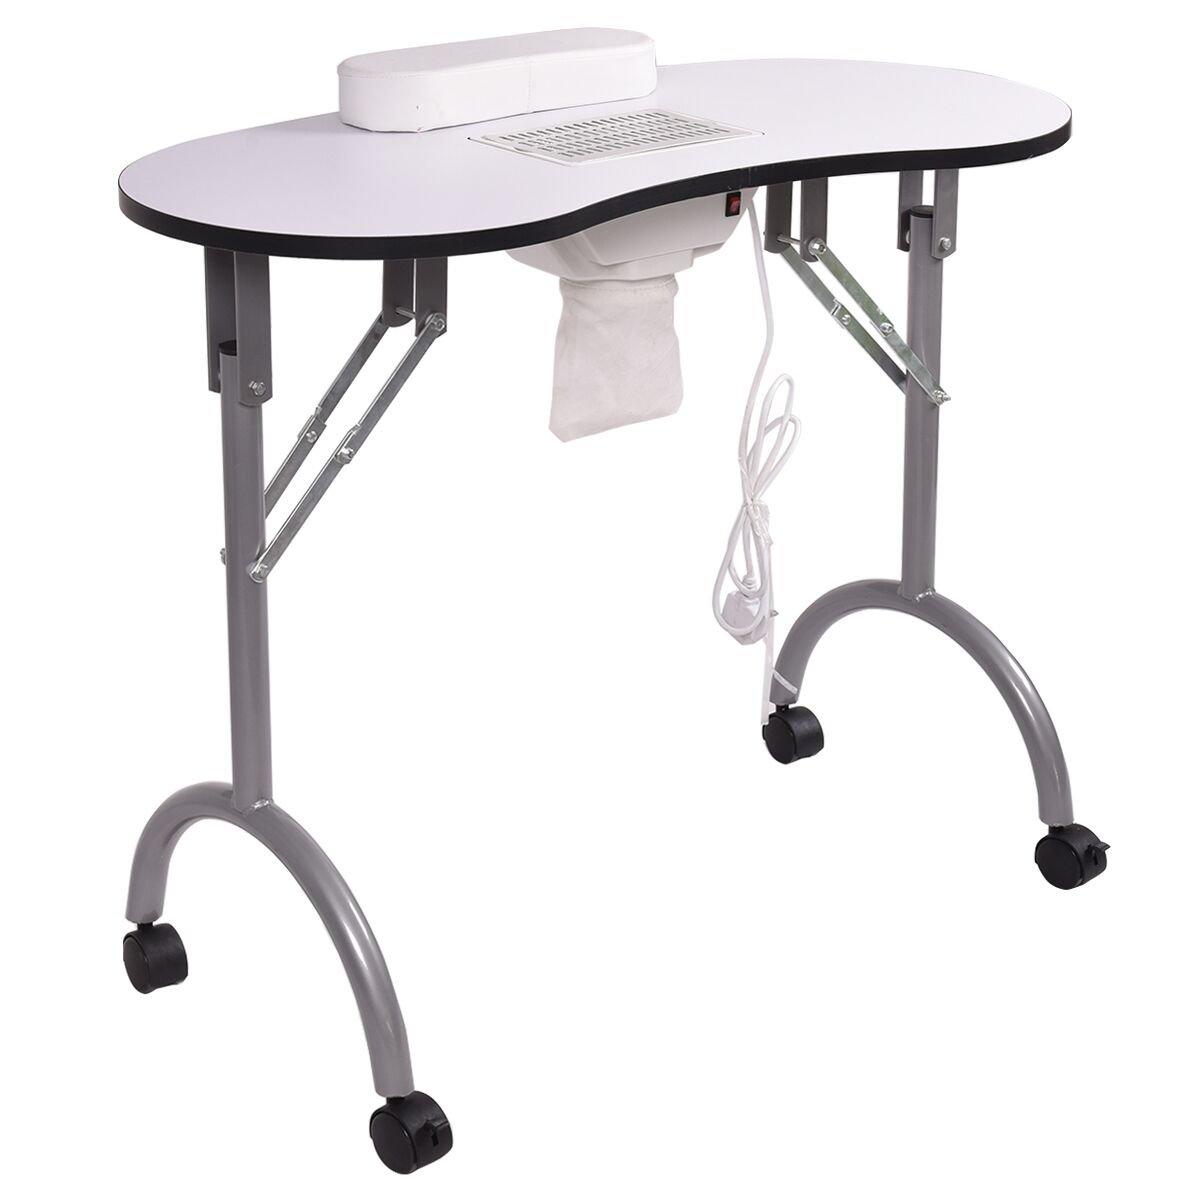 Amazon.com : Giantex Folding Portable Vented Manicure Table Nail ...